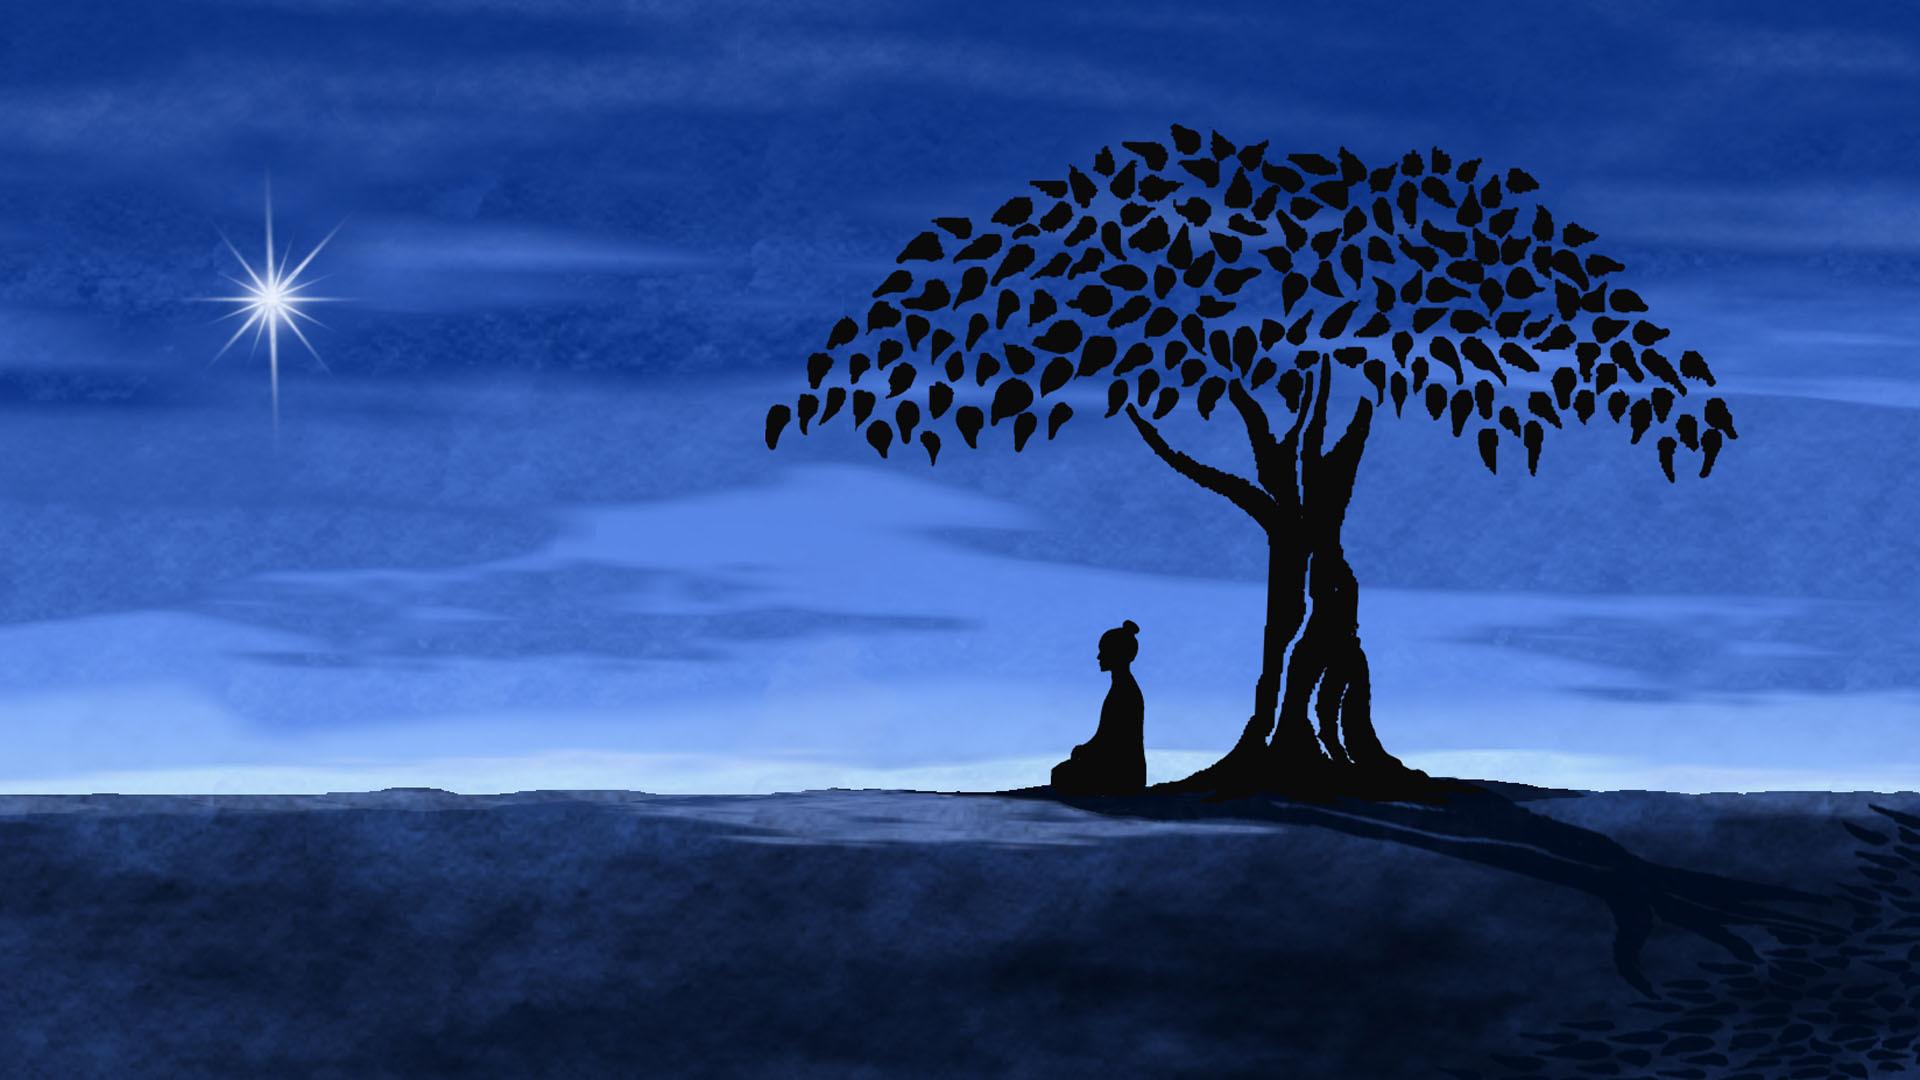 Meditation Wallpaper Hd Posted By John Walker